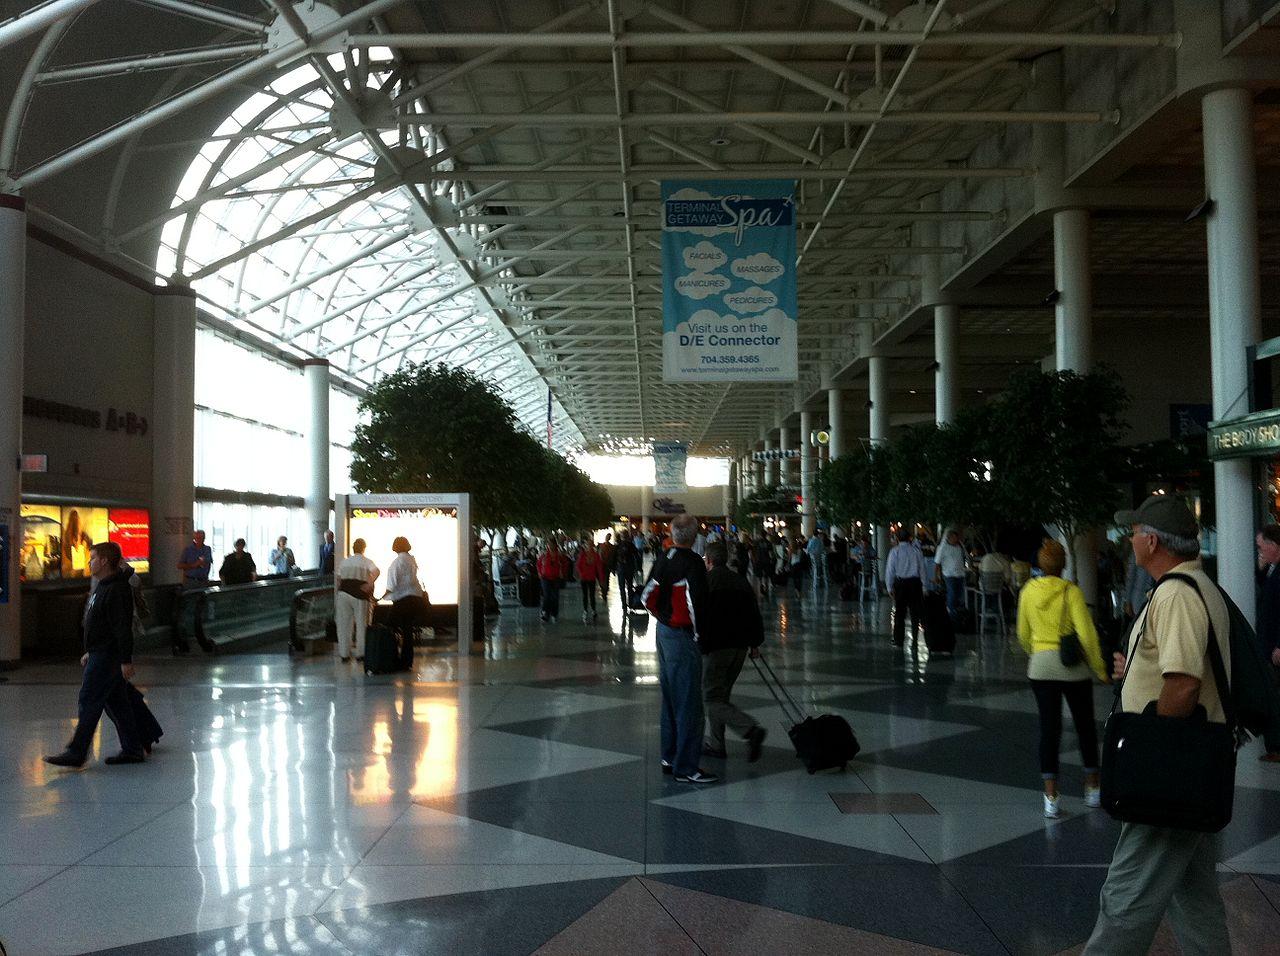 Charlotte Douglas Airport